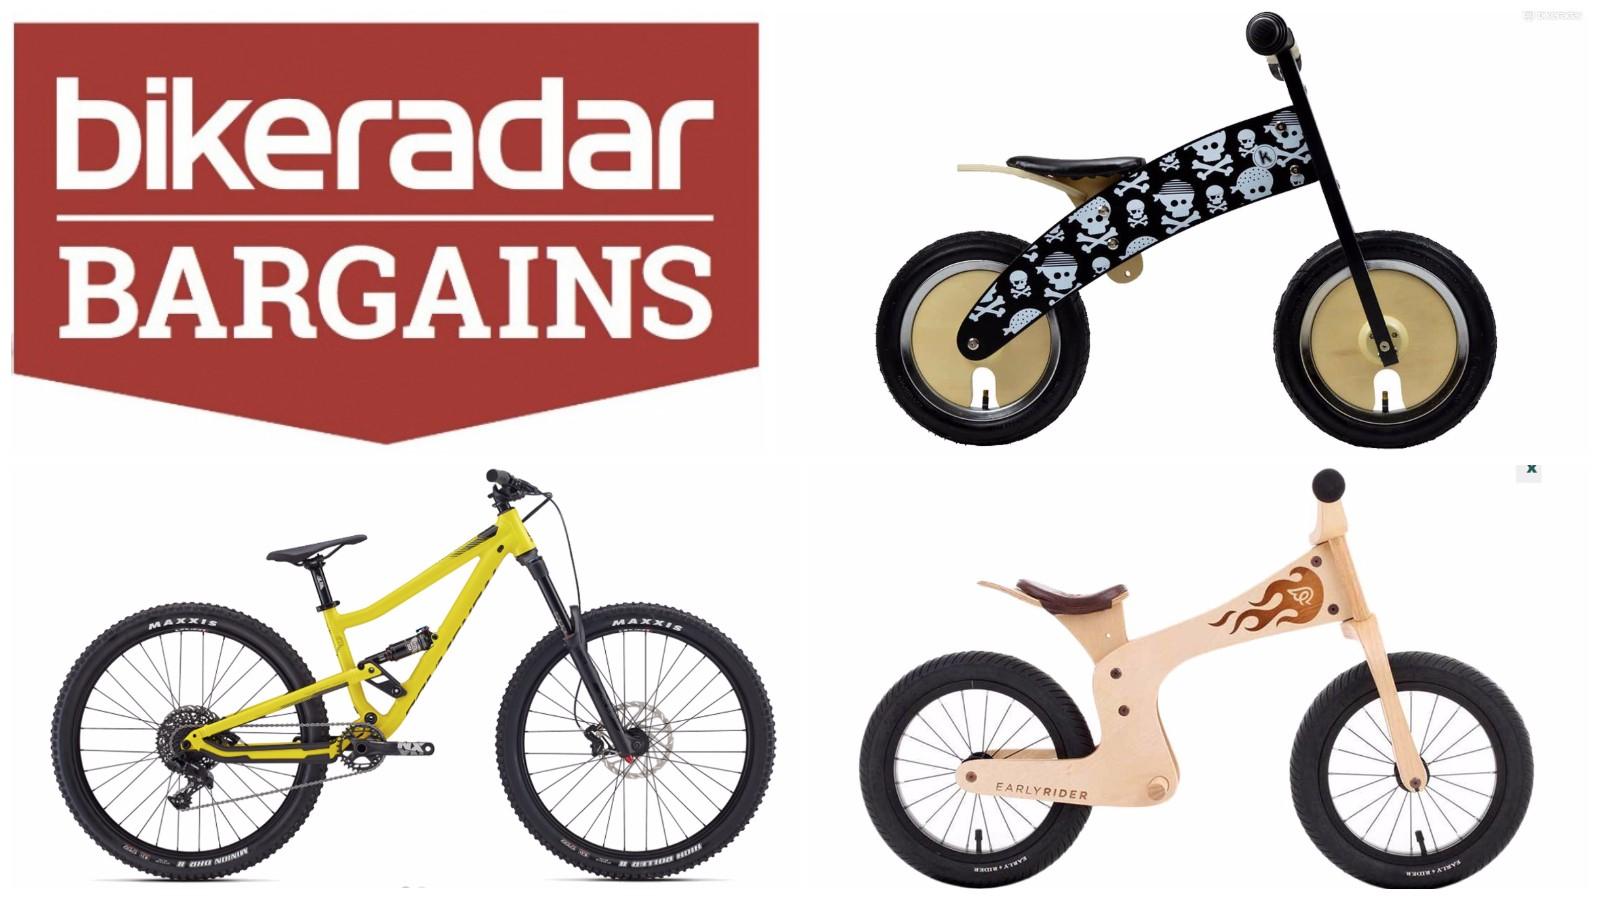 Discounted kids' bikes